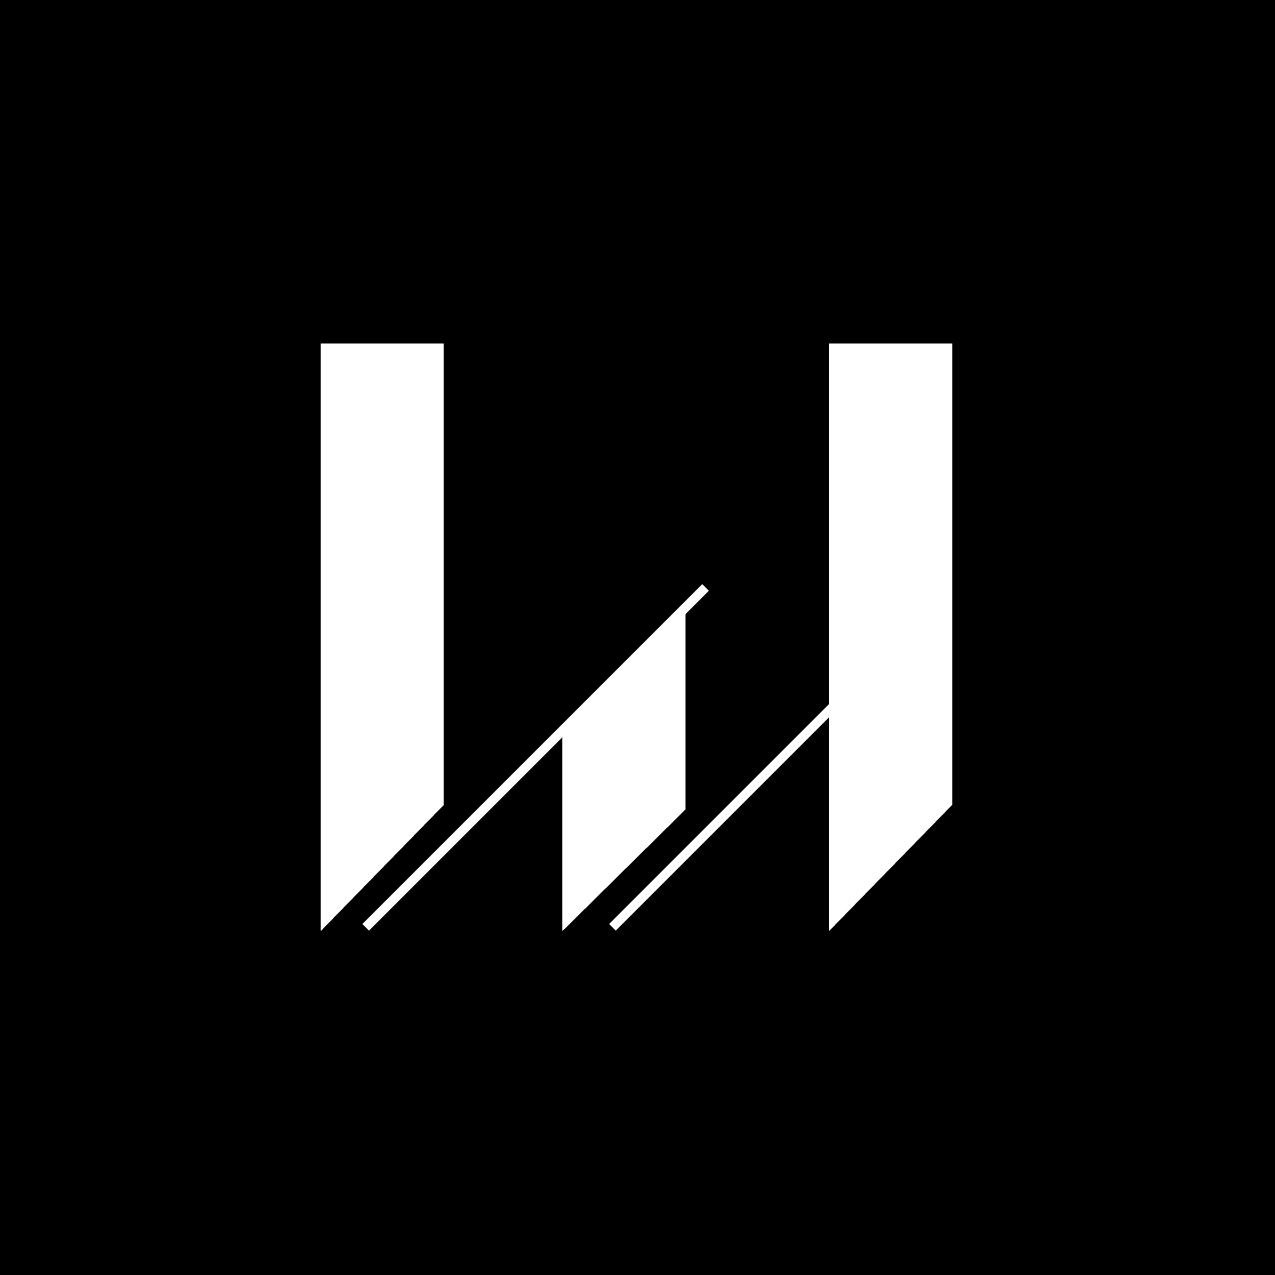 Letter W13 Design by Furia